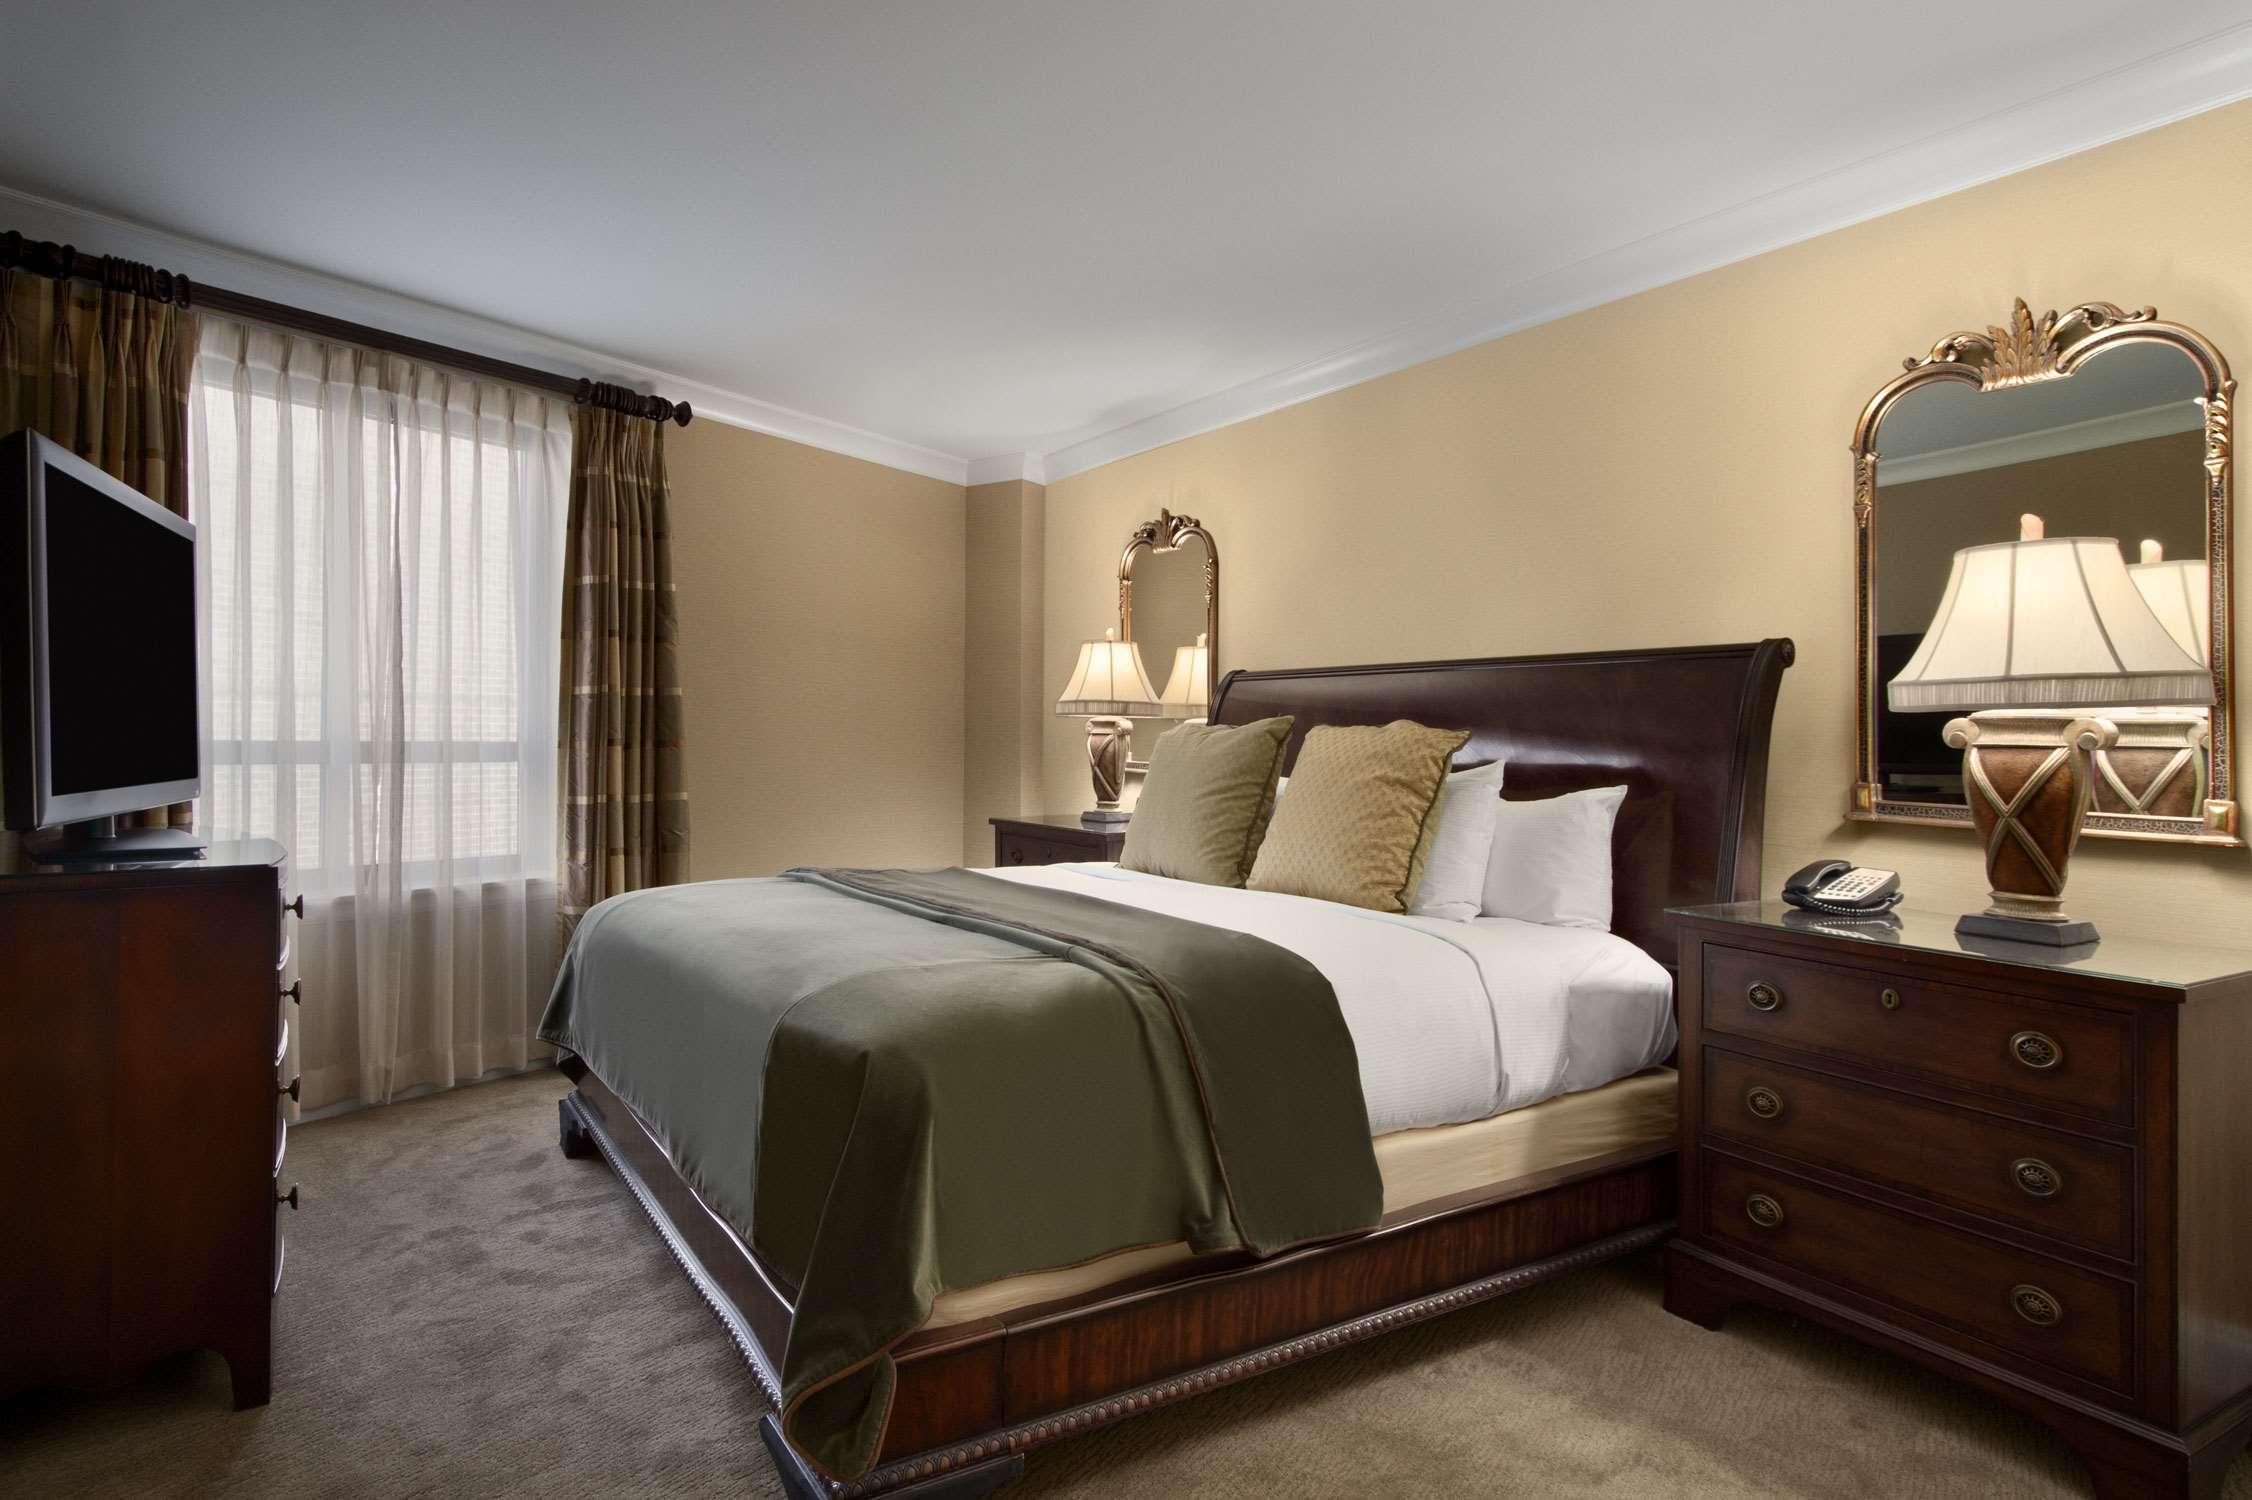 Embassy Suites by Hilton Washington DC Convention Center image 11